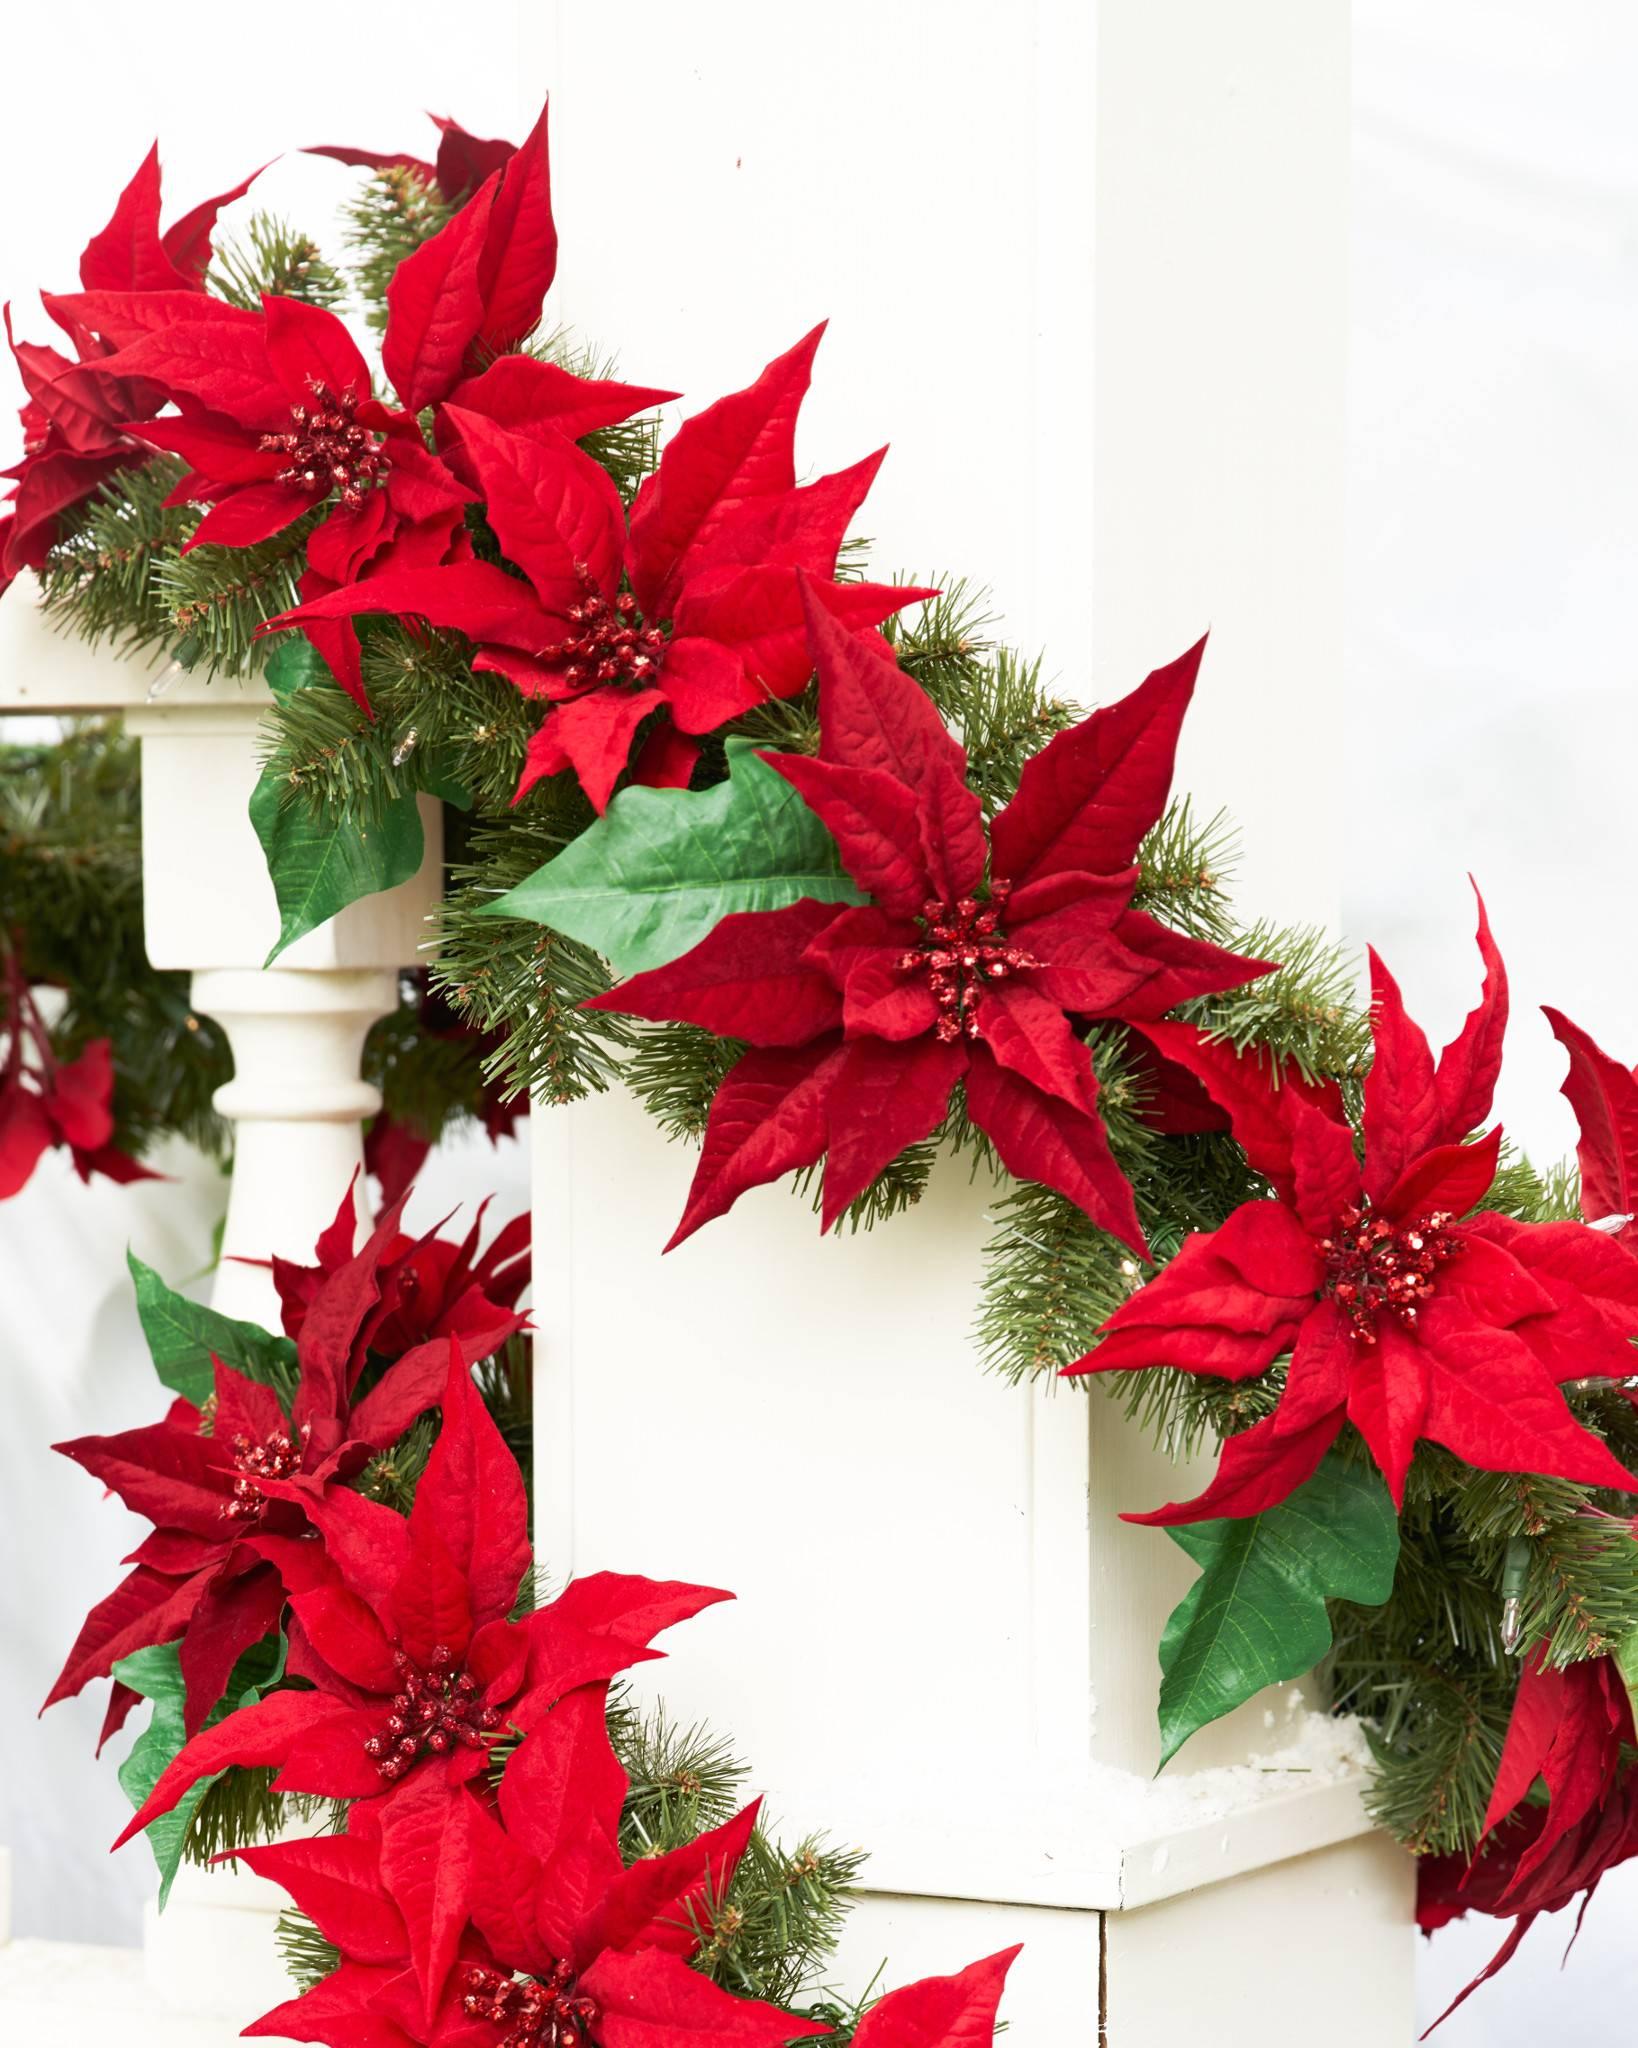 Poinsettia christmas wreath and garland balsam hill uk for 5ft poinsettia garland christmas decoration